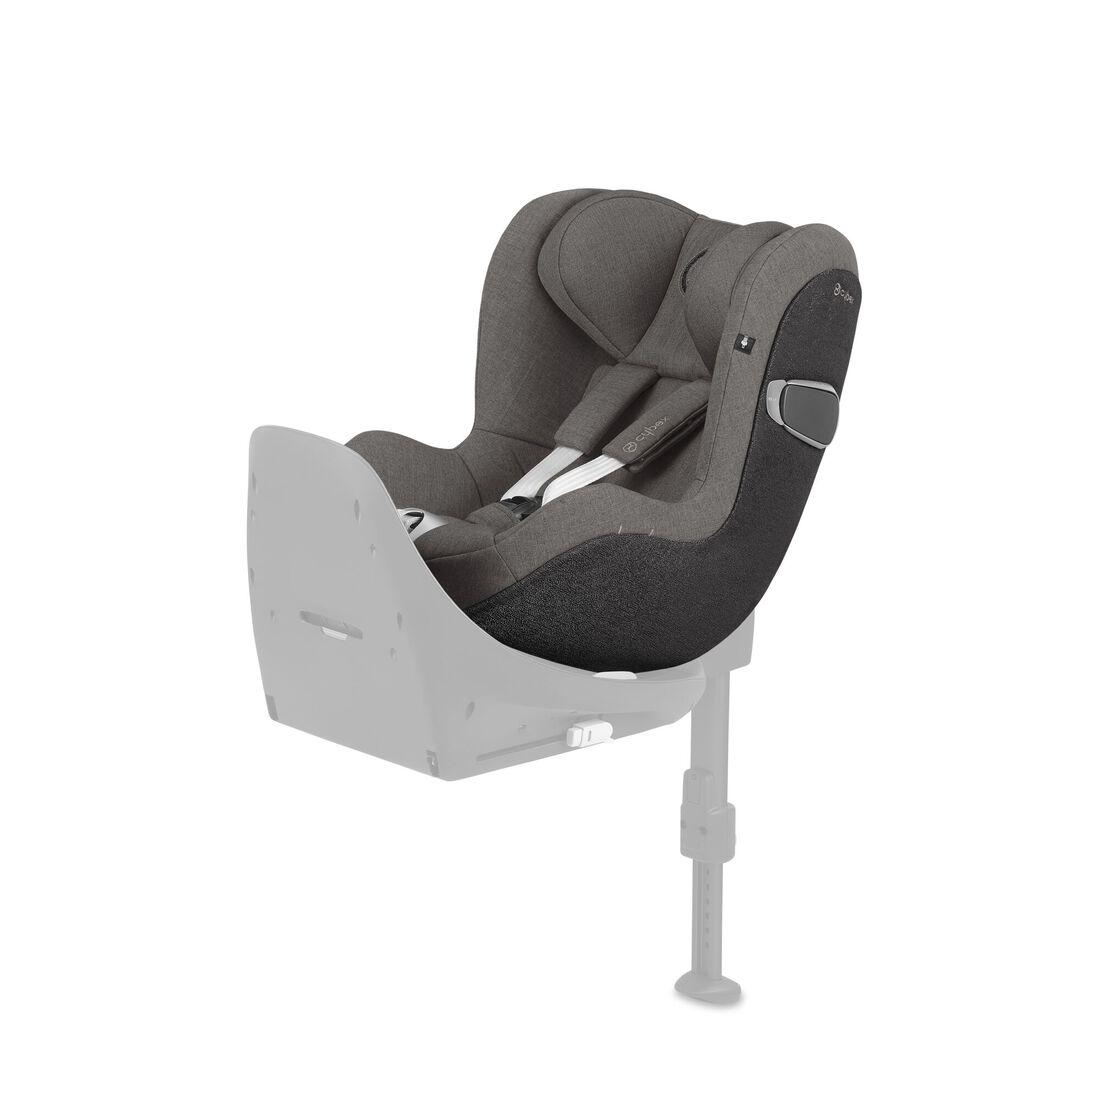 CYBEX Sirona Z i-Size - Soho Grey Plus in Soho Grey Plus large Bild 1